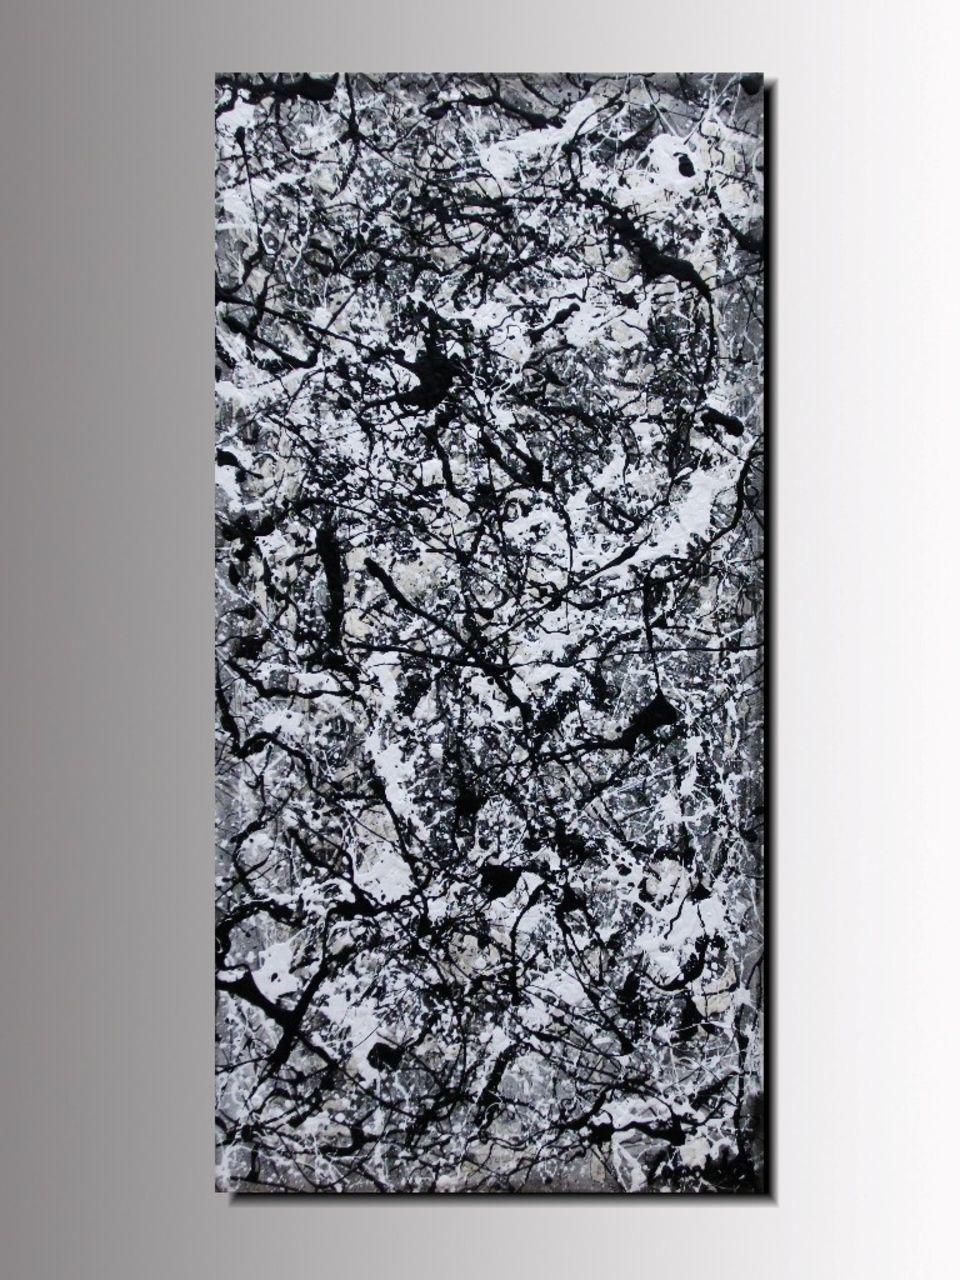 MISTER K  (Lepolsk Matuszewski)  PLATINUM expressionnisme abstrait contemporain Lepolsk Matuszewski 2011 artiste peintre plasticien - Copie